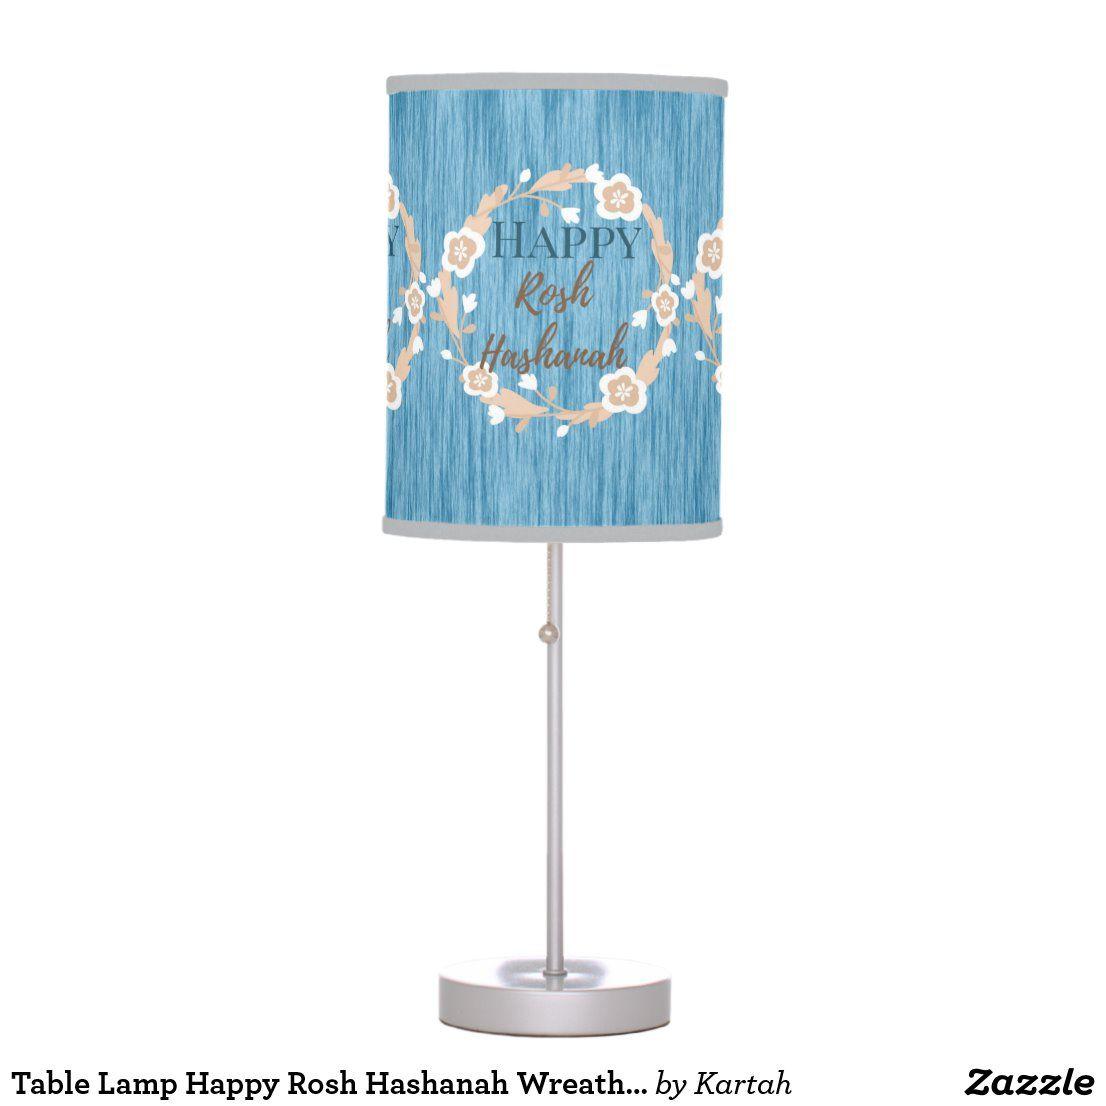 Table Lamp Happy Rosh Hashanah Wreath Floral | Zazzle.com